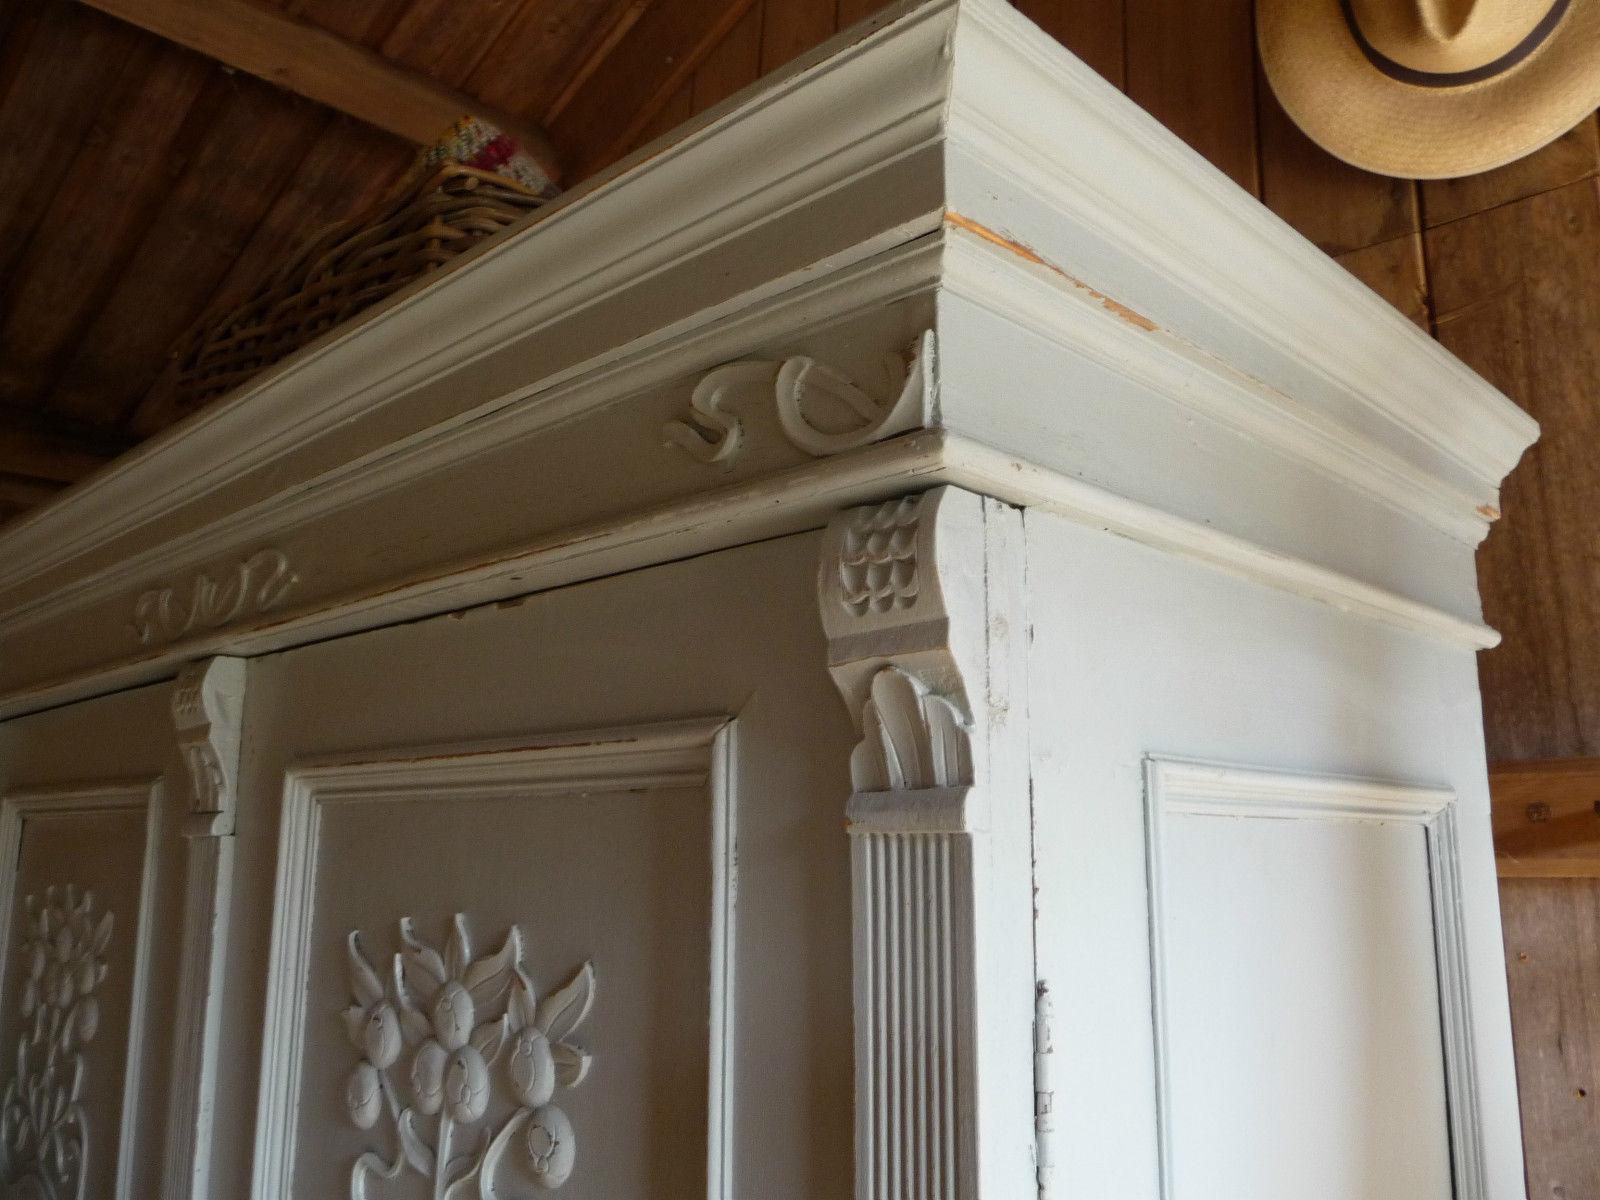 shabby-chic-garde-robe-hall-robe-armoire-armoire-peinte-_57